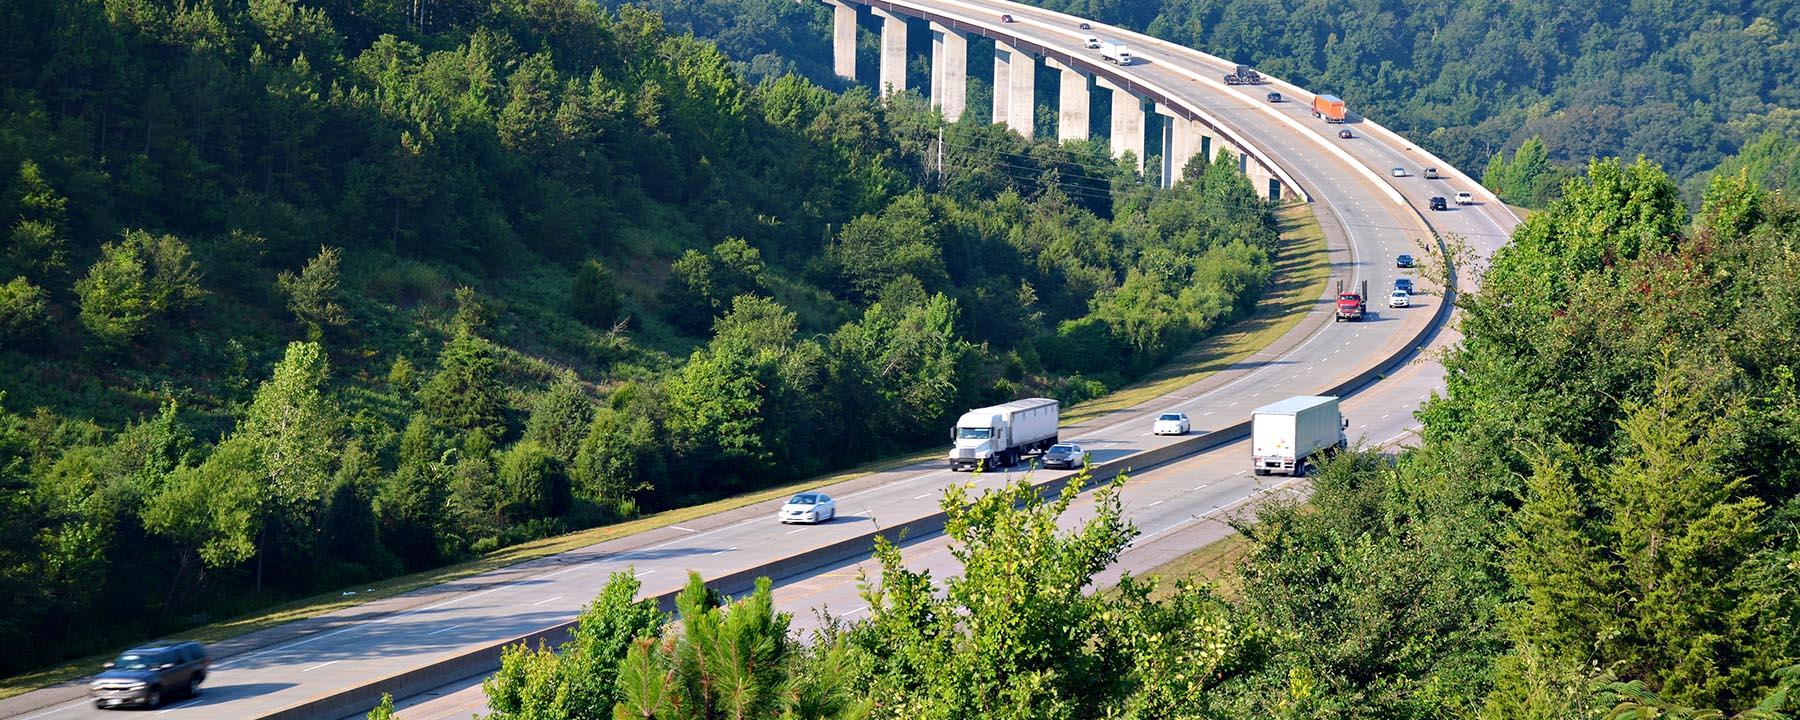 Arkansas-Good-Roads-Foundation-Objectives-Image